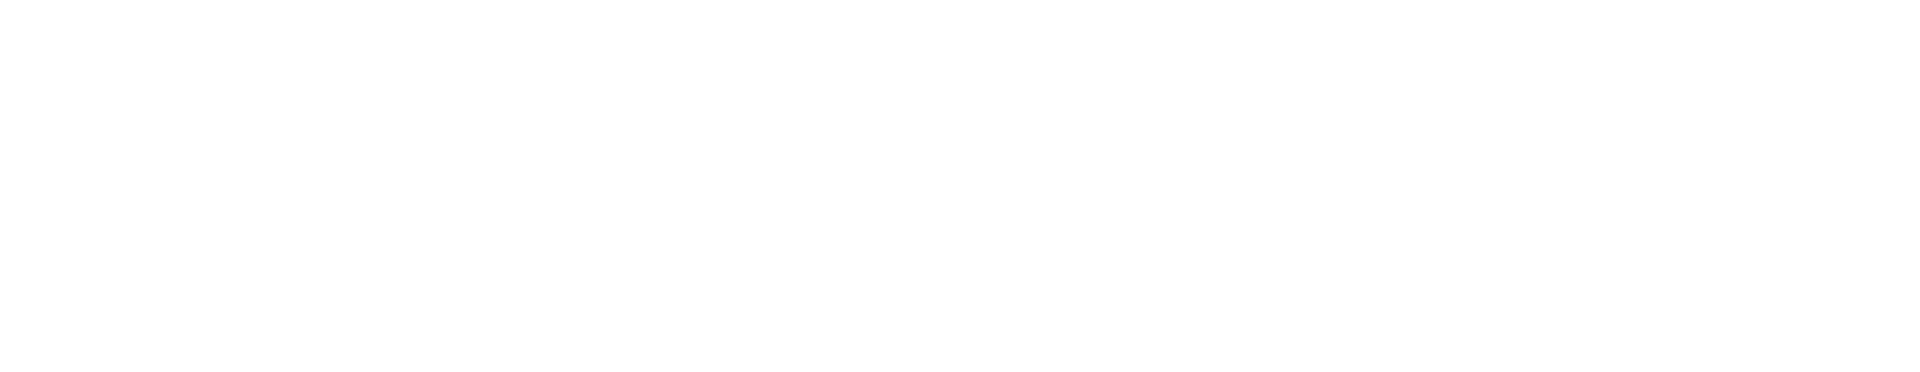 LaVIESTA